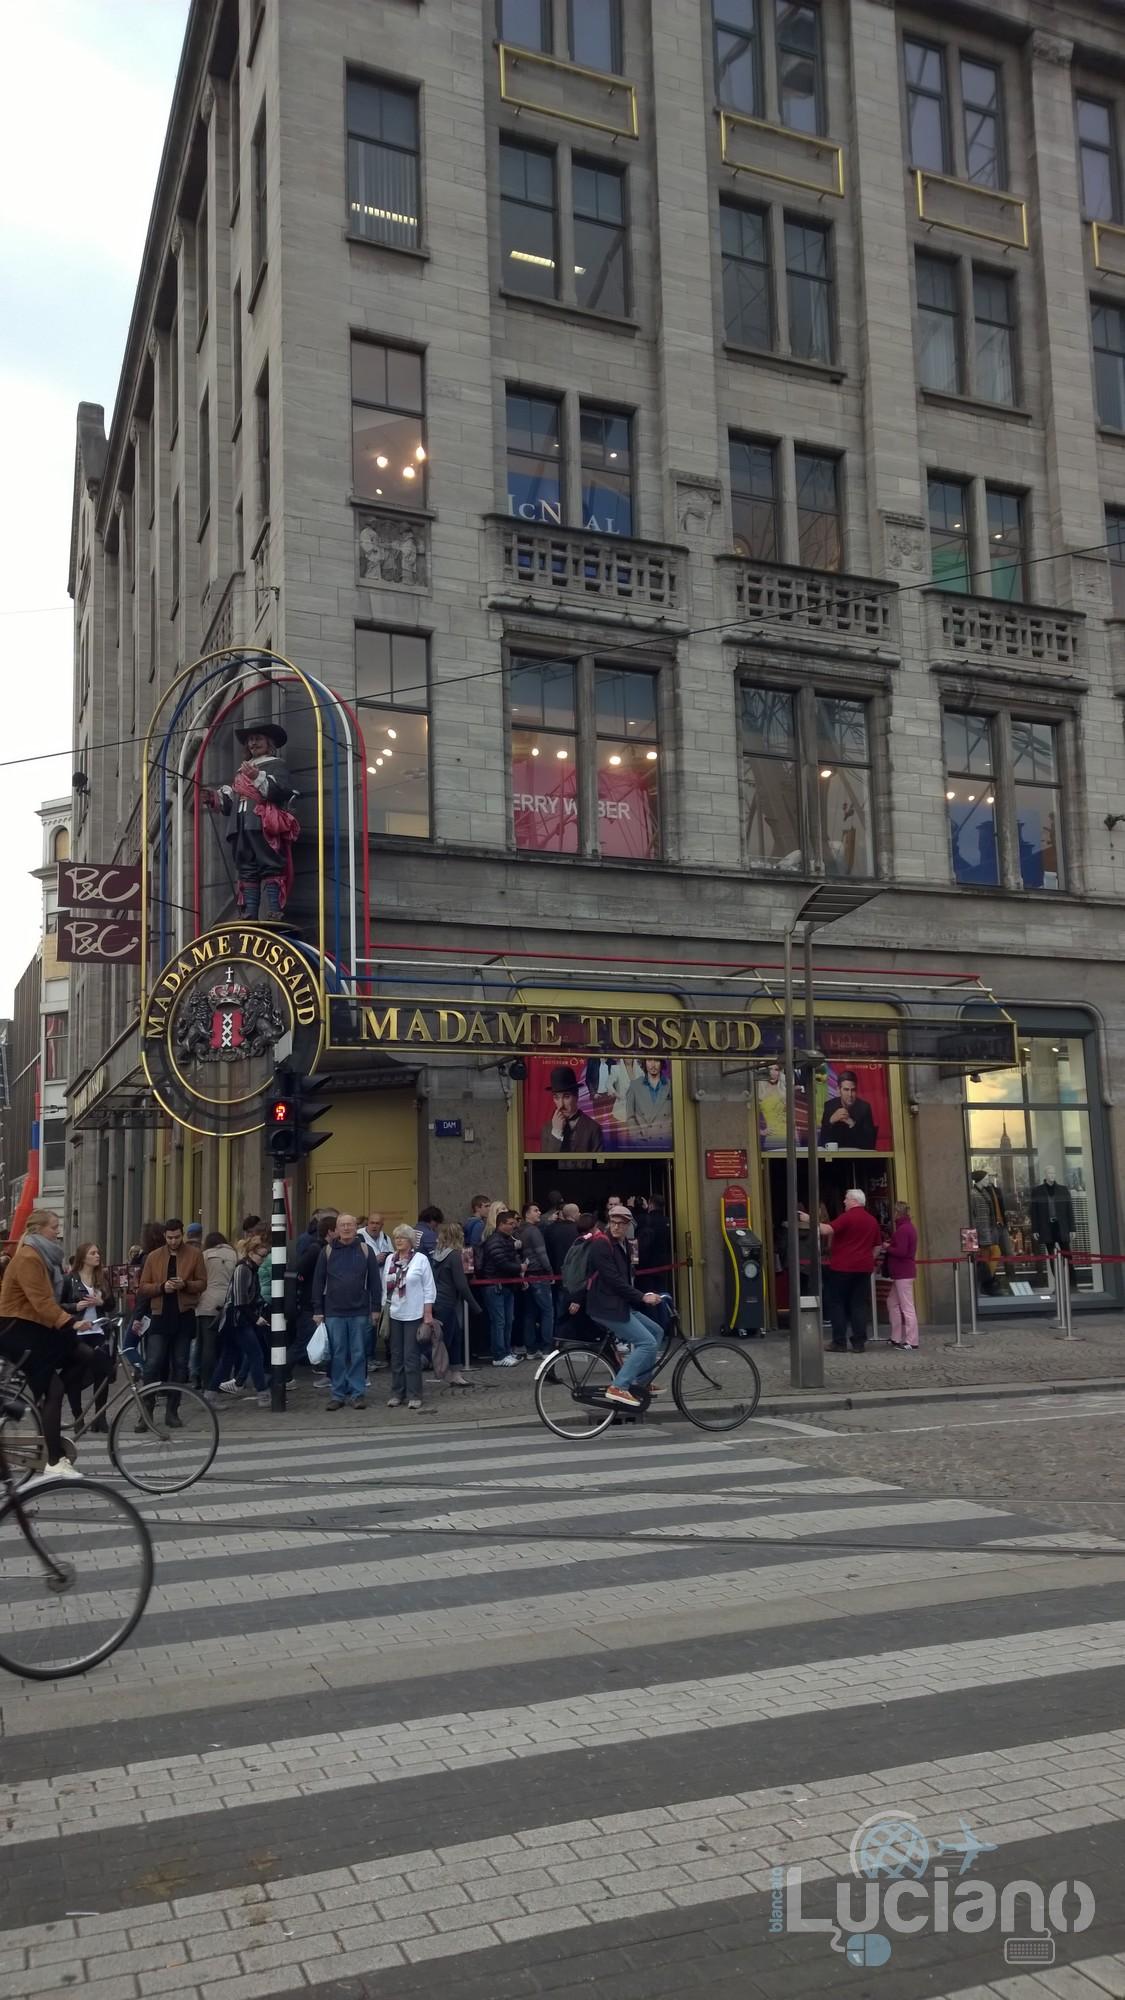 amsterdam-2014-vueling-lucianoblancatoit (72)